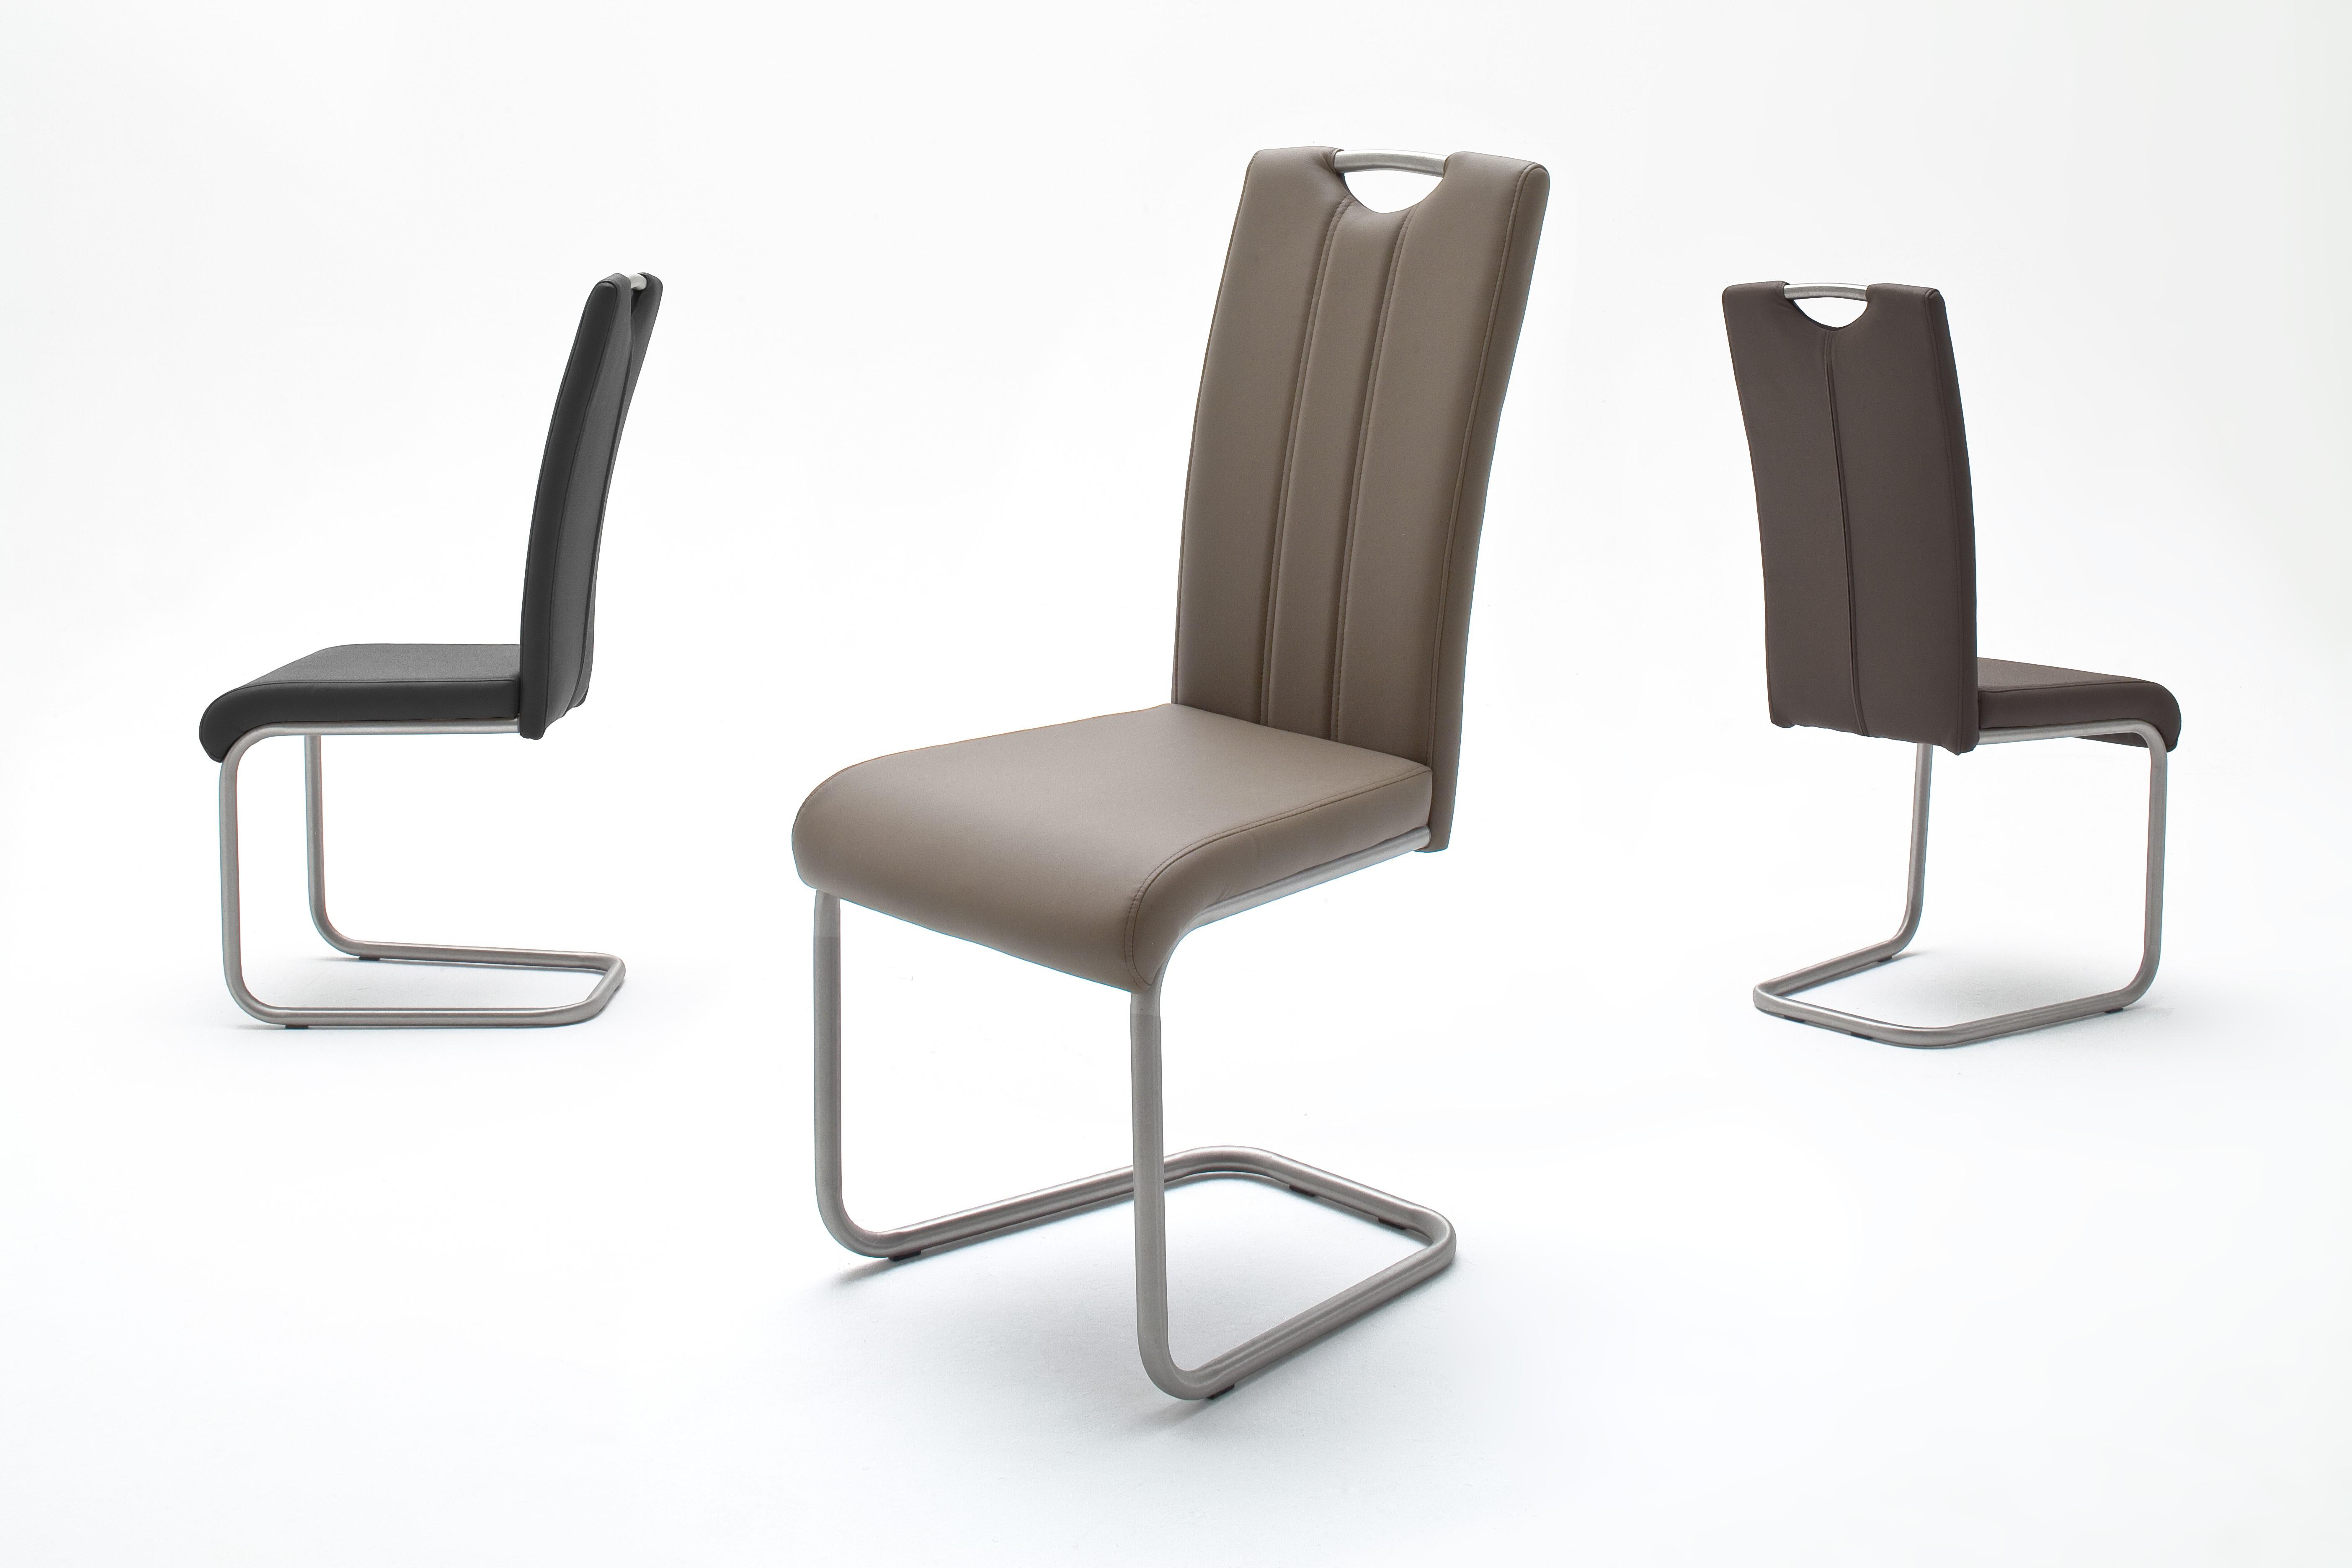 chaise cuir finest chaise en cuir salle a manger chaise cuir salle a manger chaises cuir new. Black Bedroom Furniture Sets. Home Design Ideas